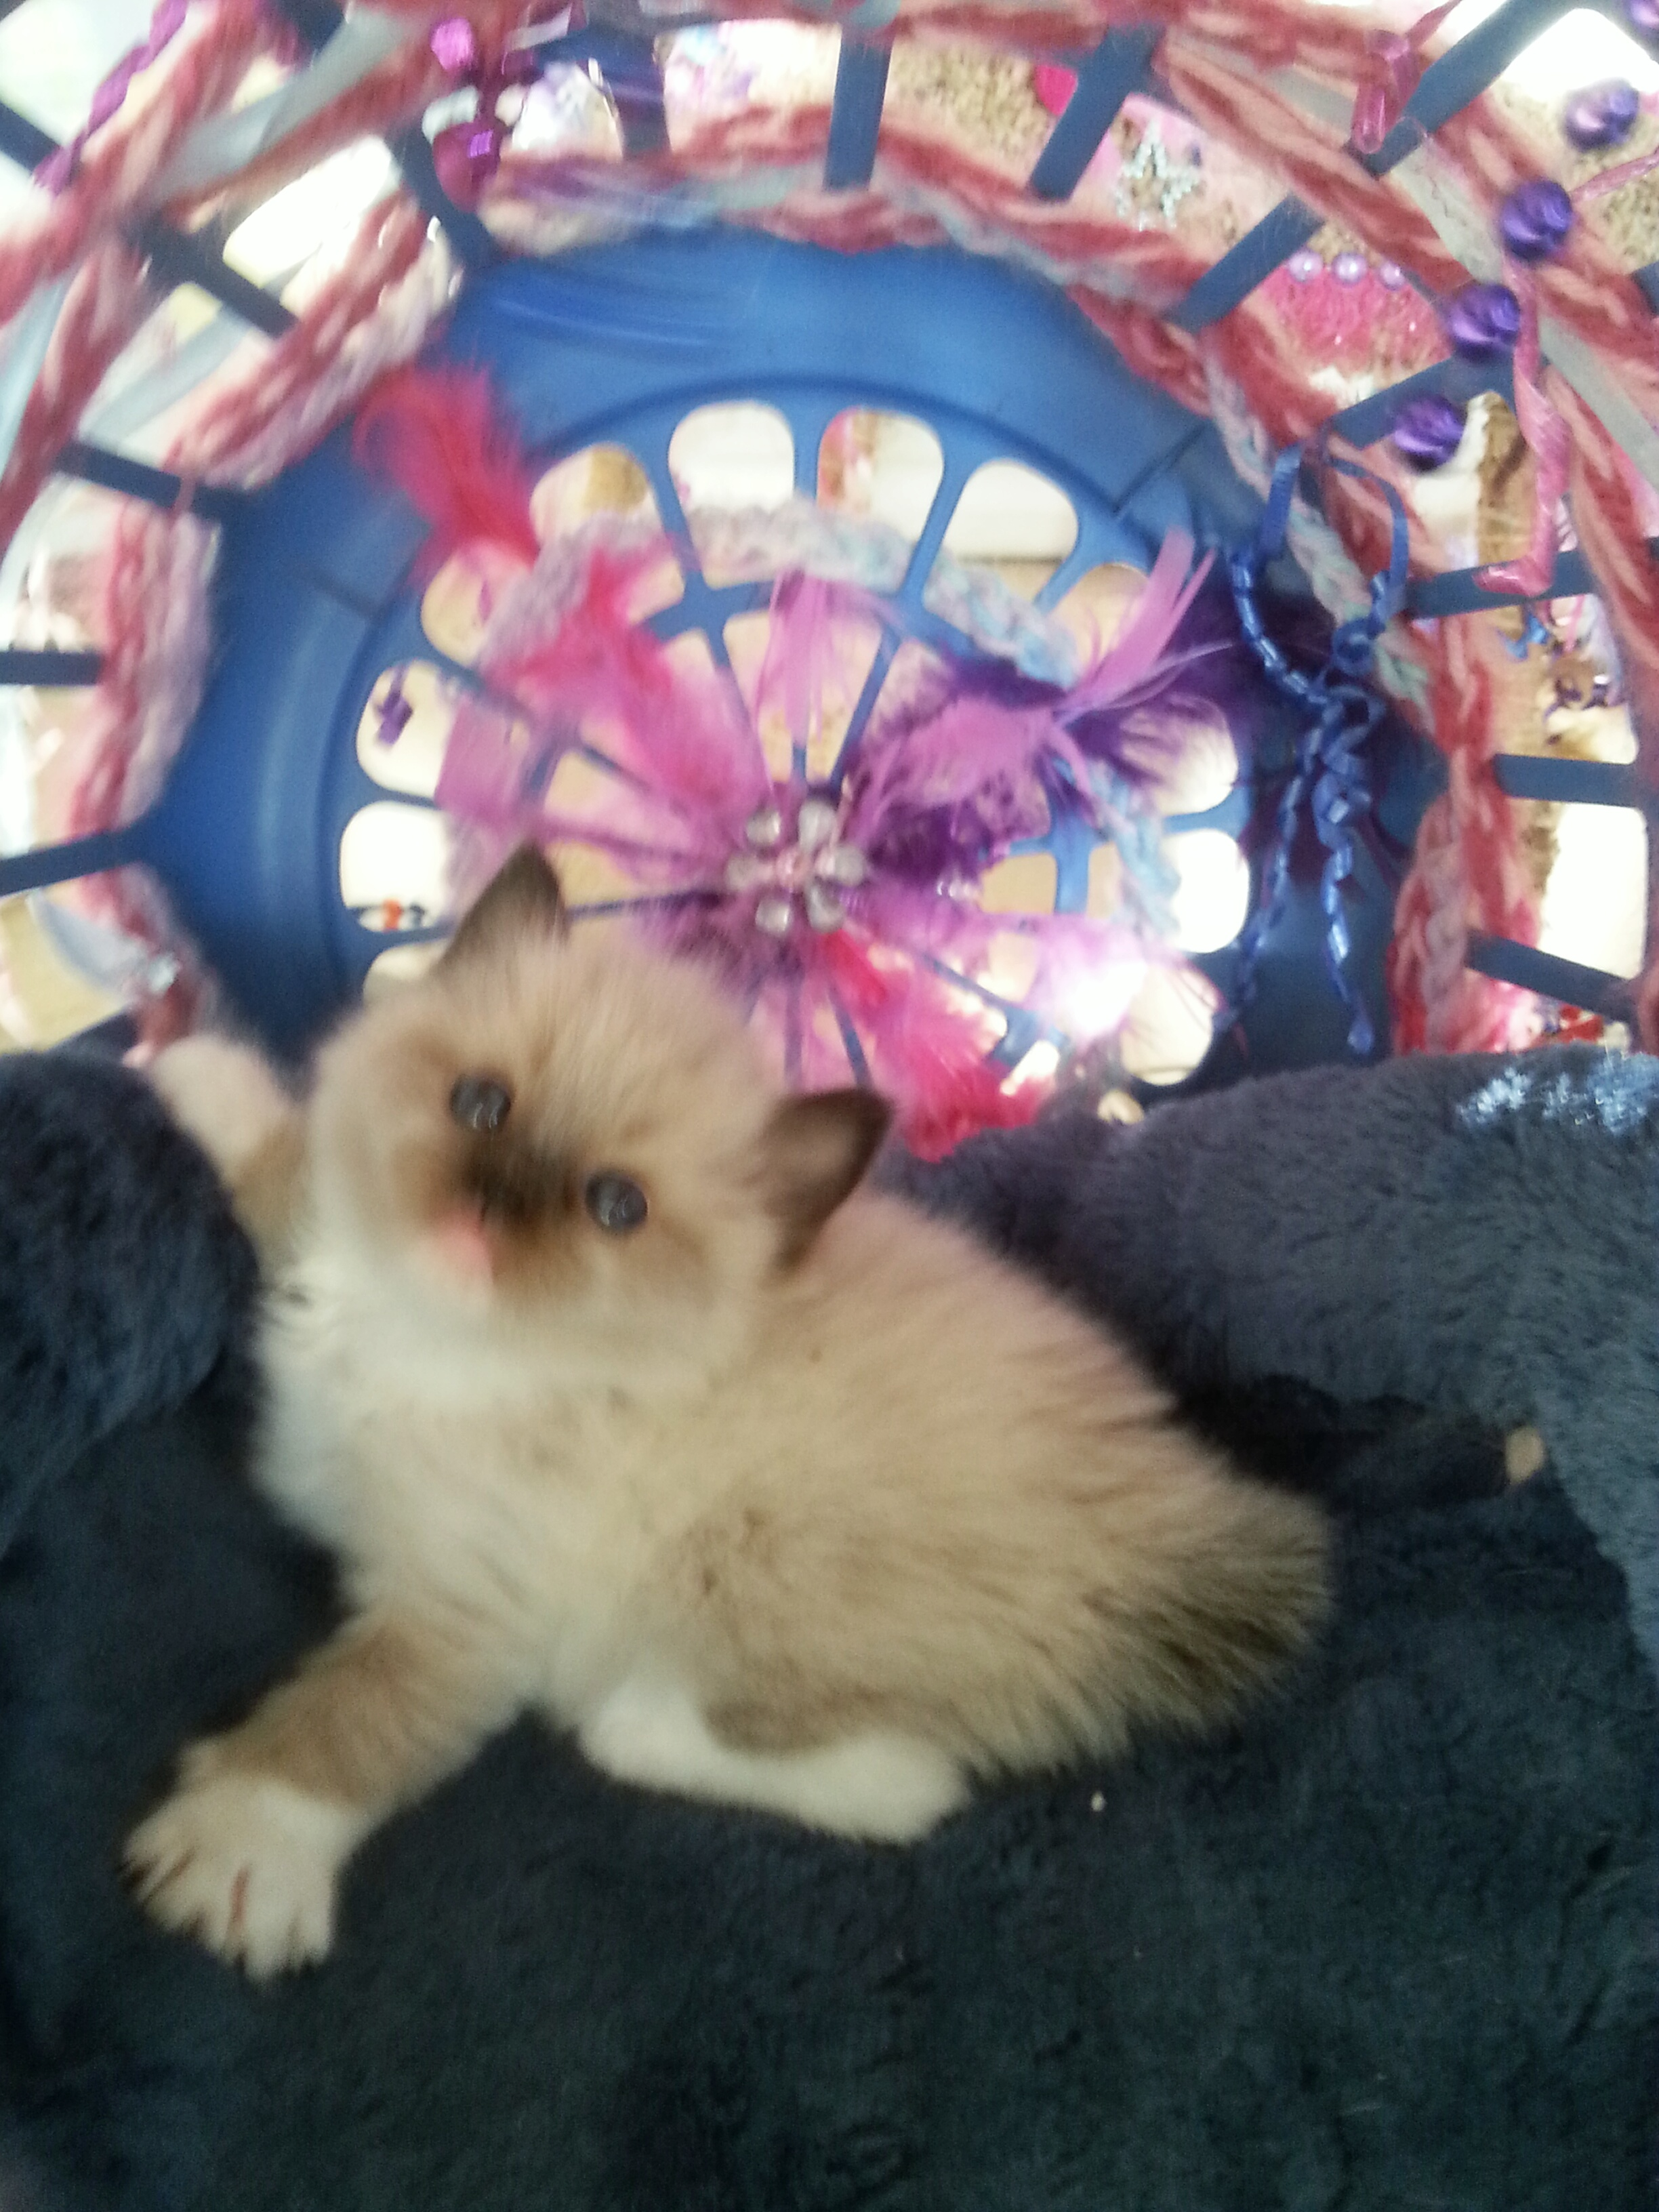 05-12-15 Kittens Shenandoah - Brodie